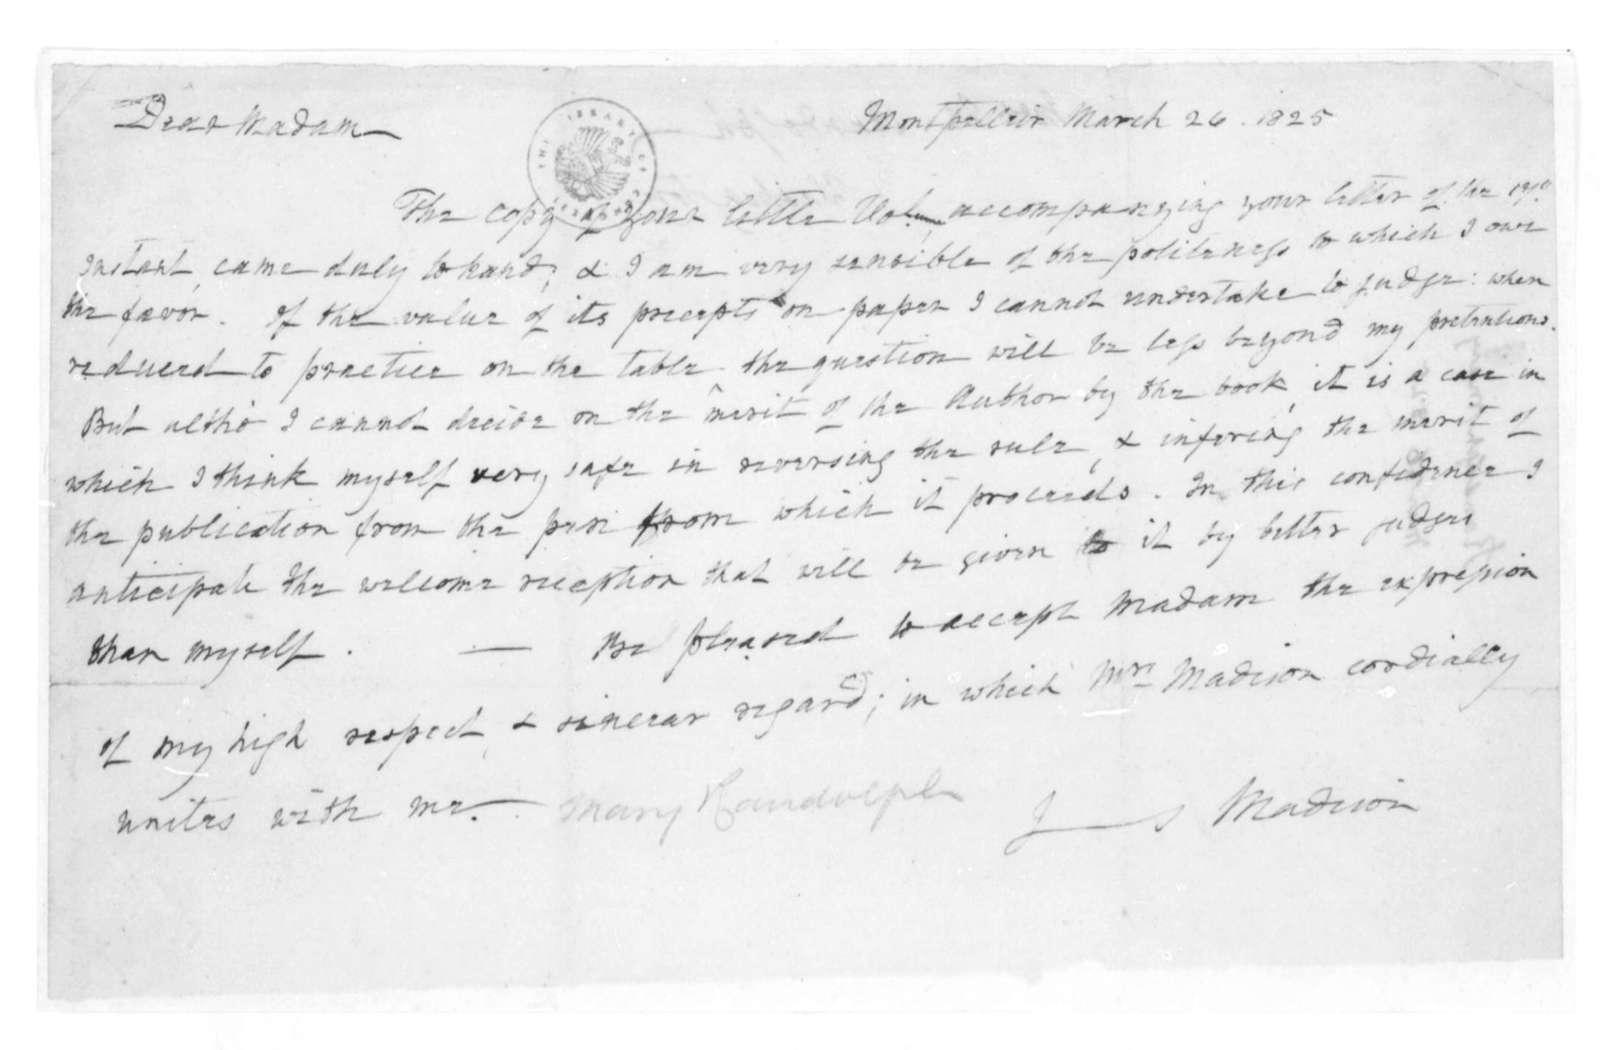 James Madison to Mary Randolph, March 26, 1825.